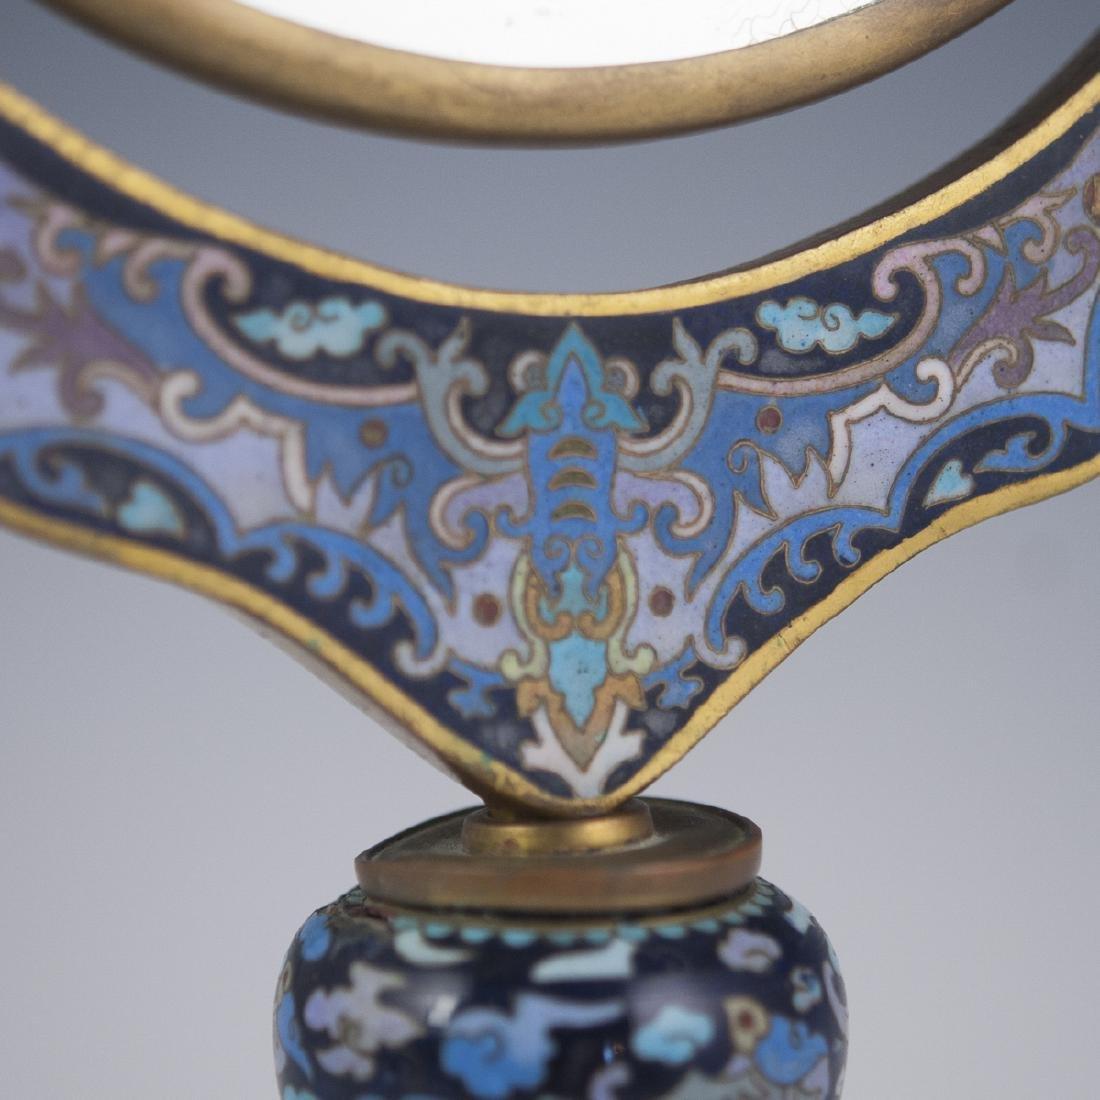 Chinese Cloisonne Enameled Vanity Mirror - 2